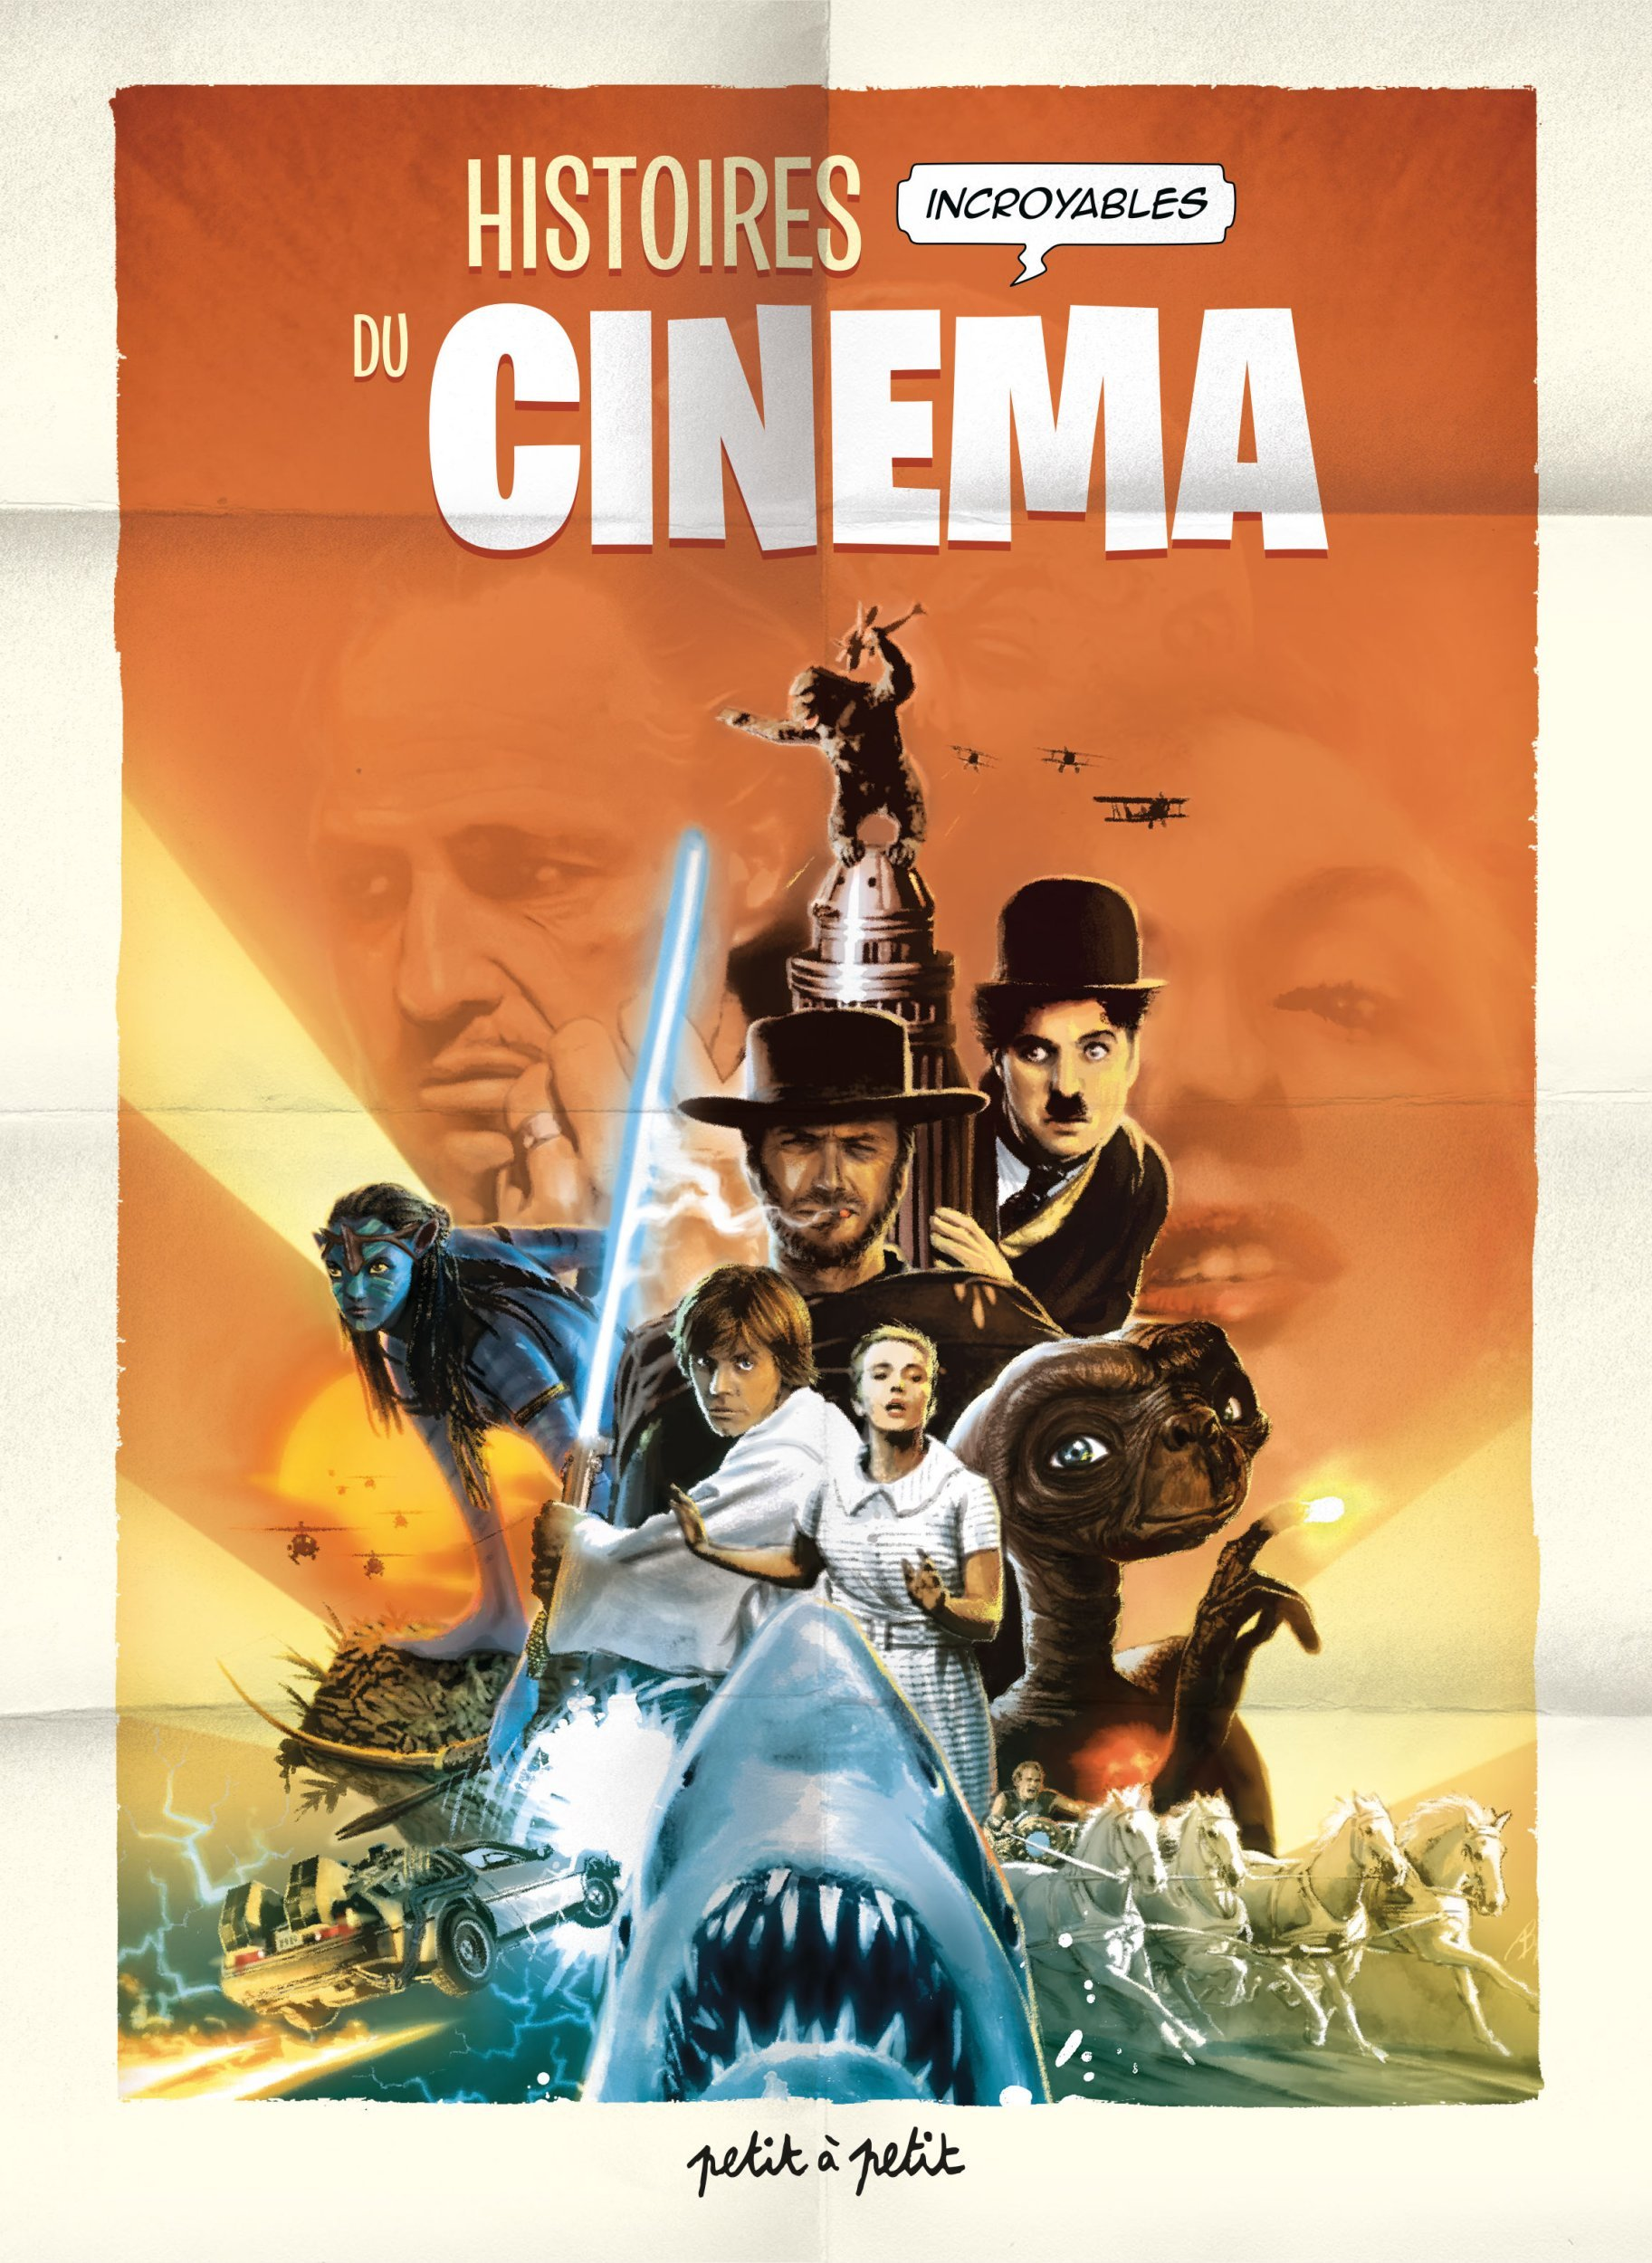 HIST. INCROYABLE CINEMA - T01 - HISTOIRES INCROYABLES DU CINEMA